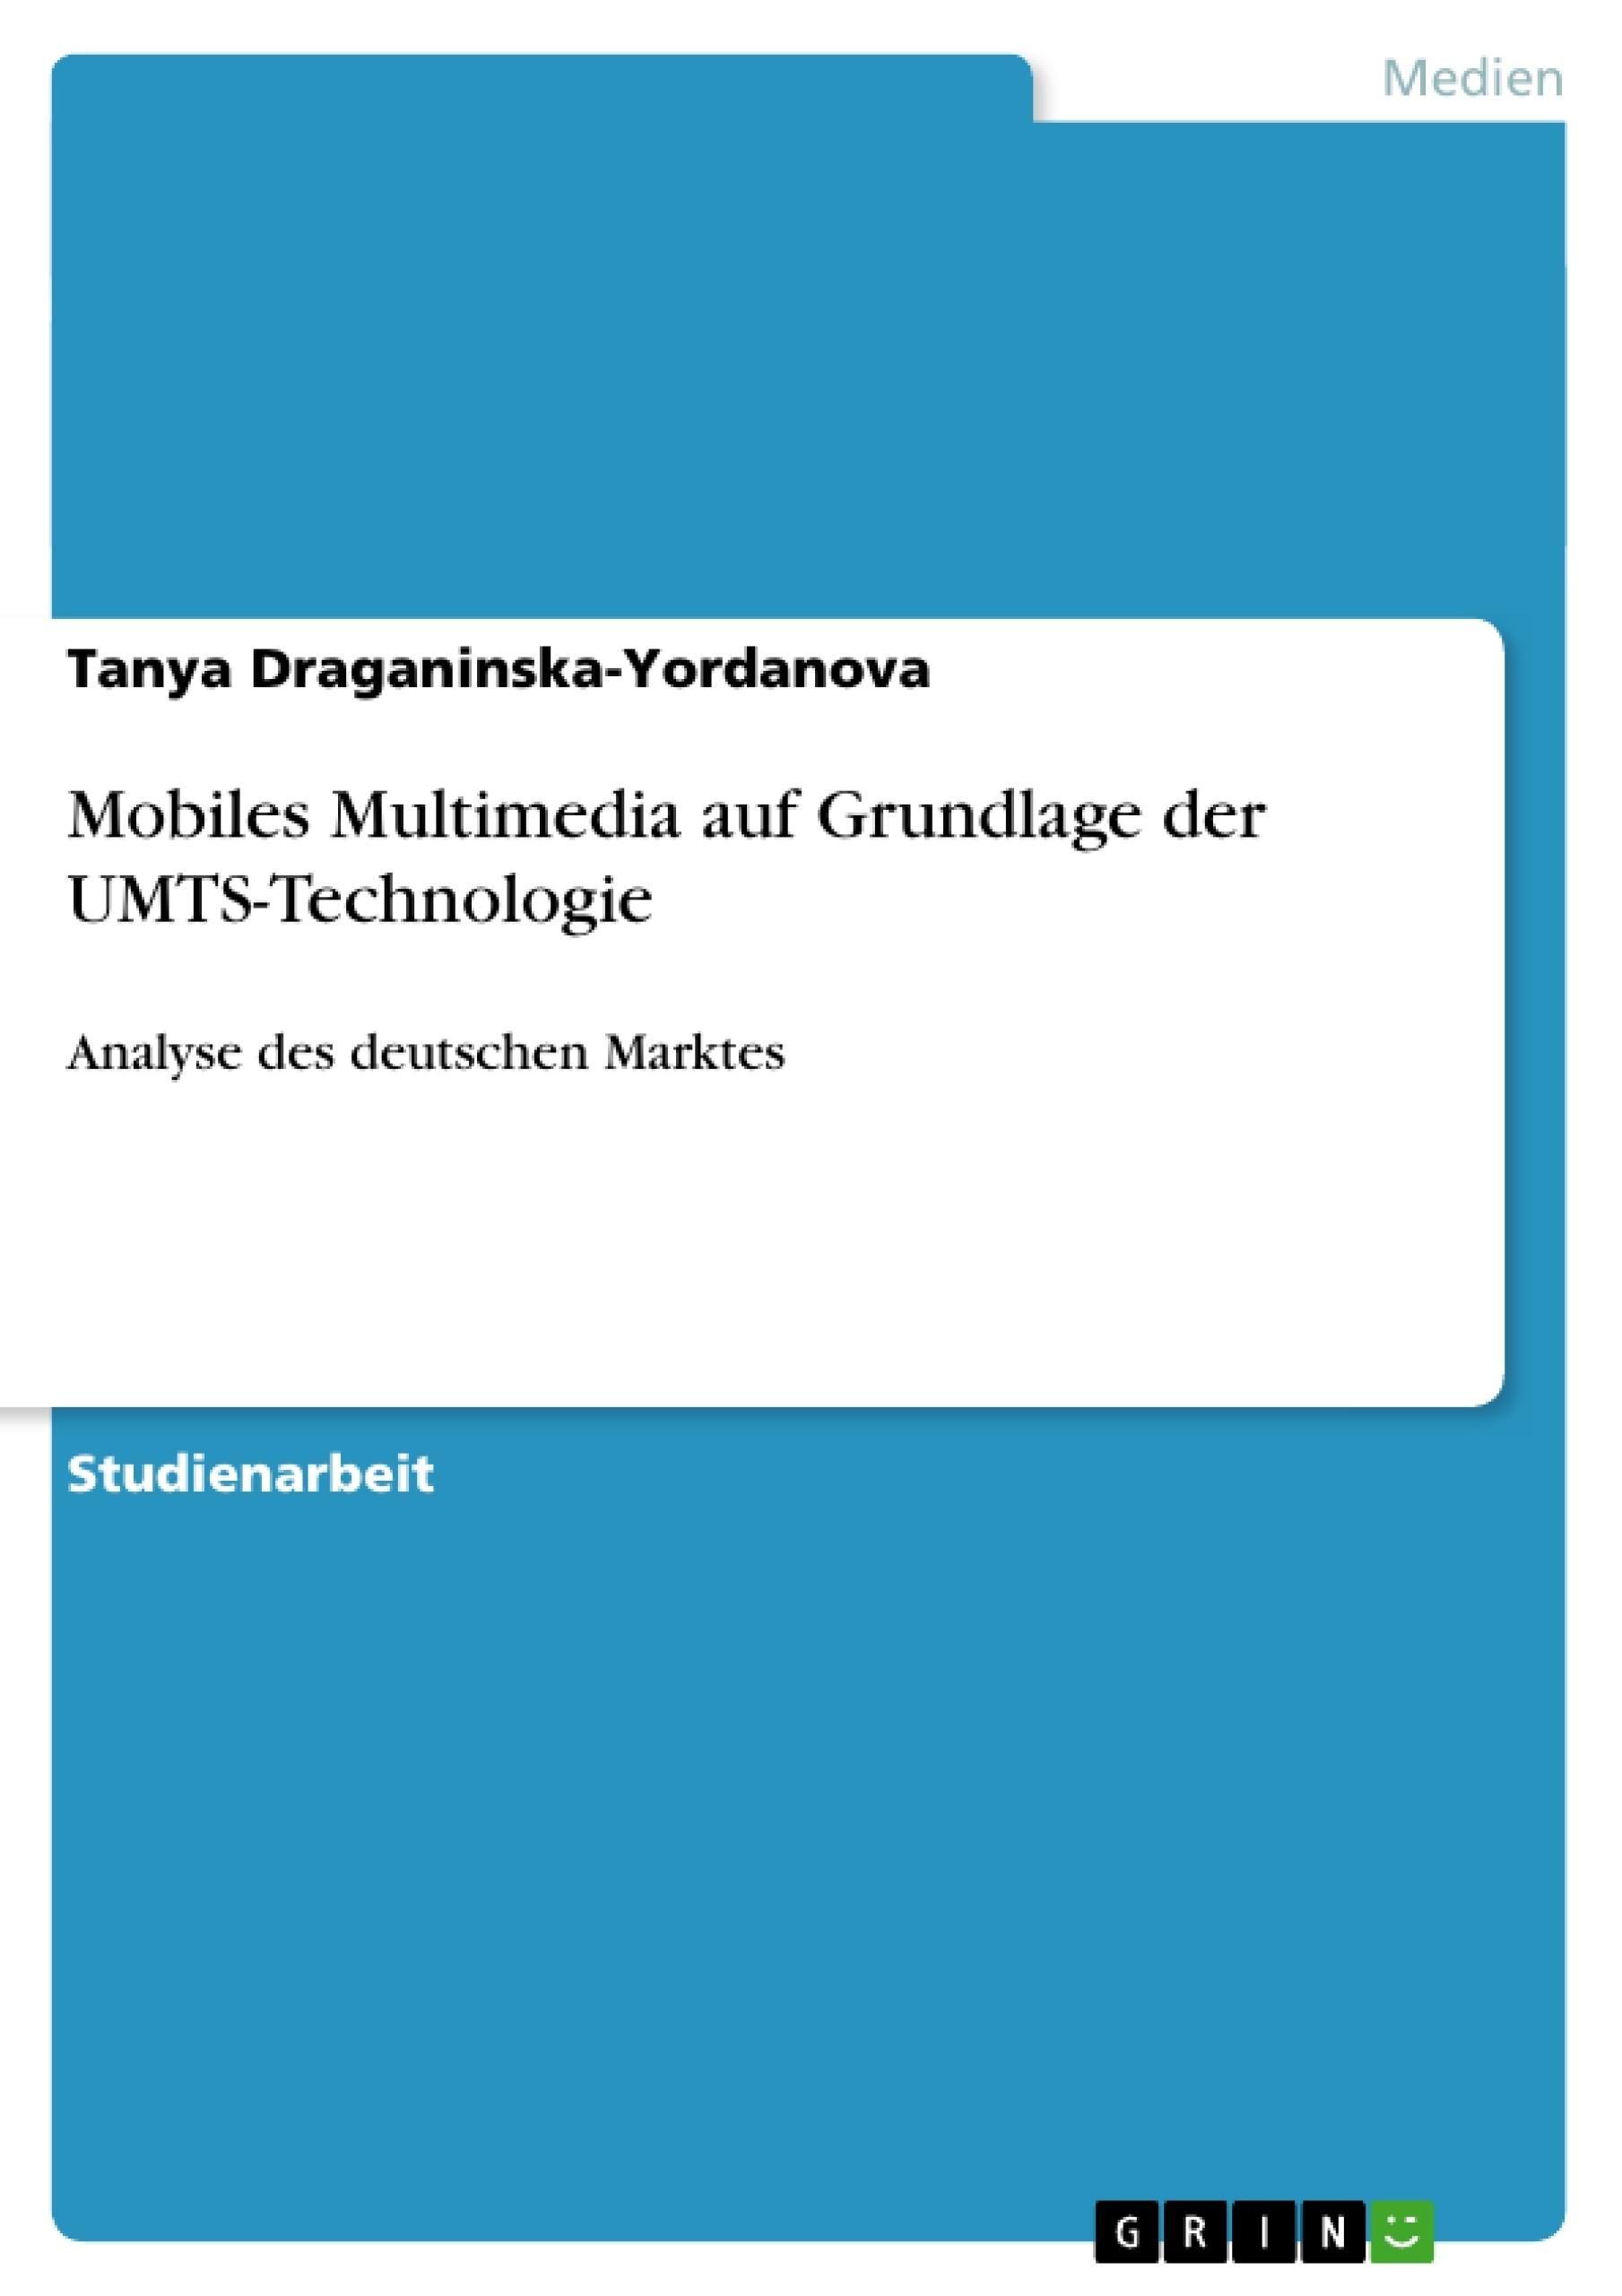 Titel: Mobiles Multimedia auf Grundlage der UMTS-Technologie